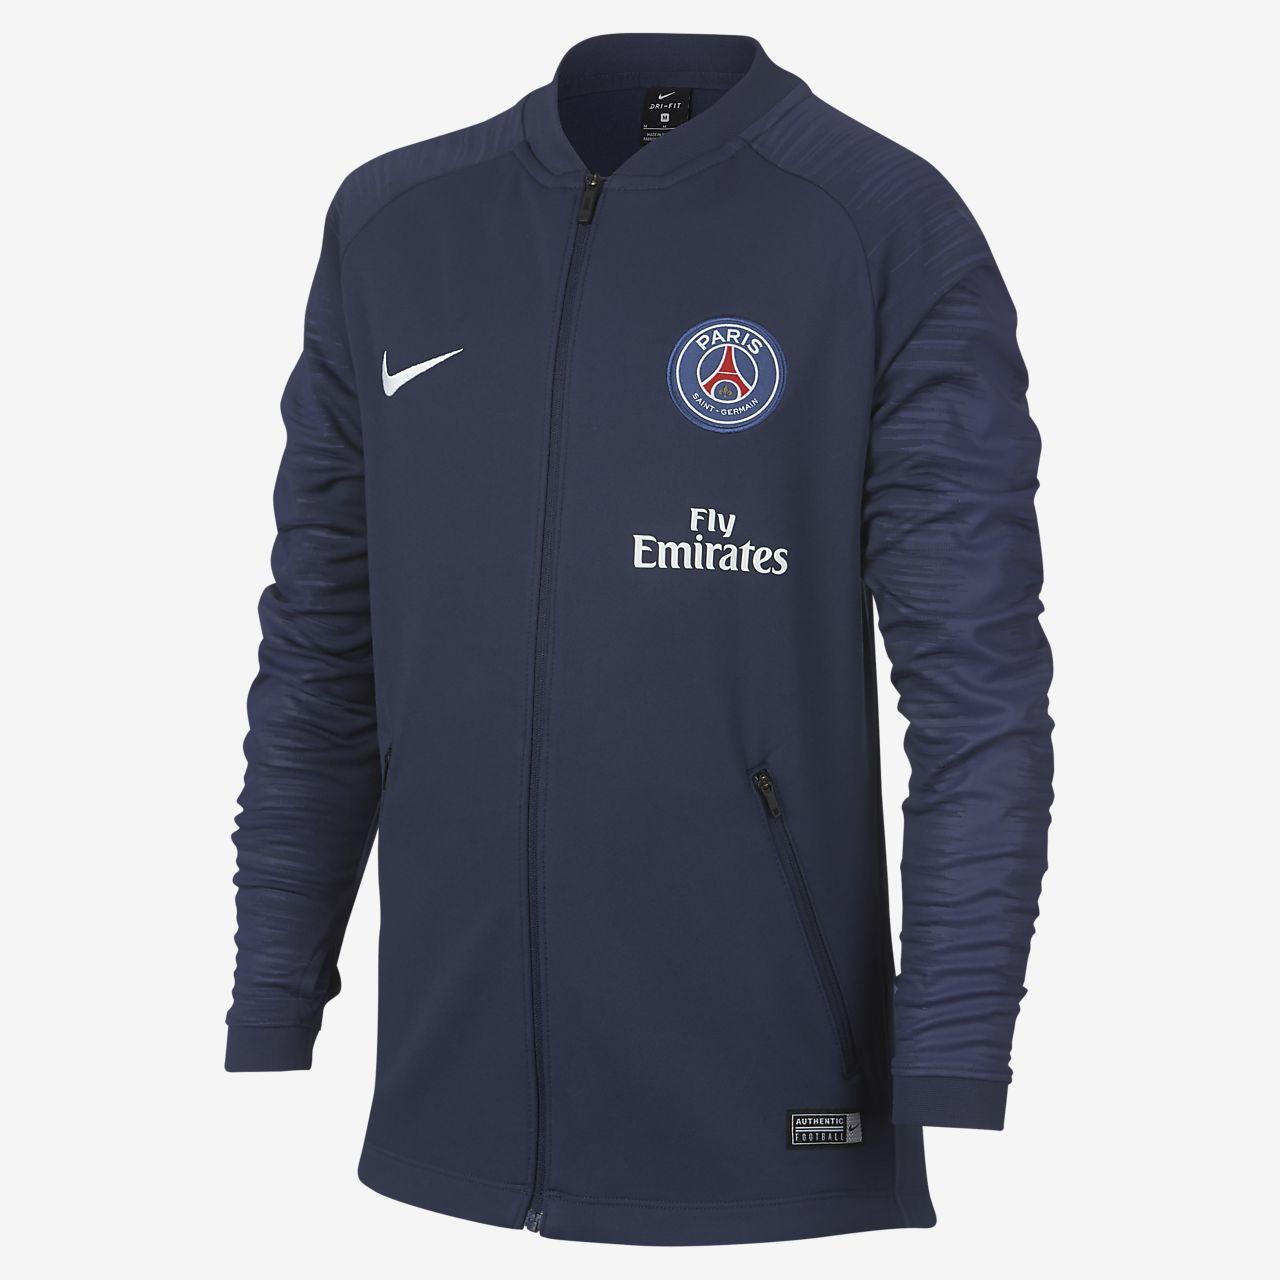 Paris Saint-Germain Anthem Older Kids' Football Jacket